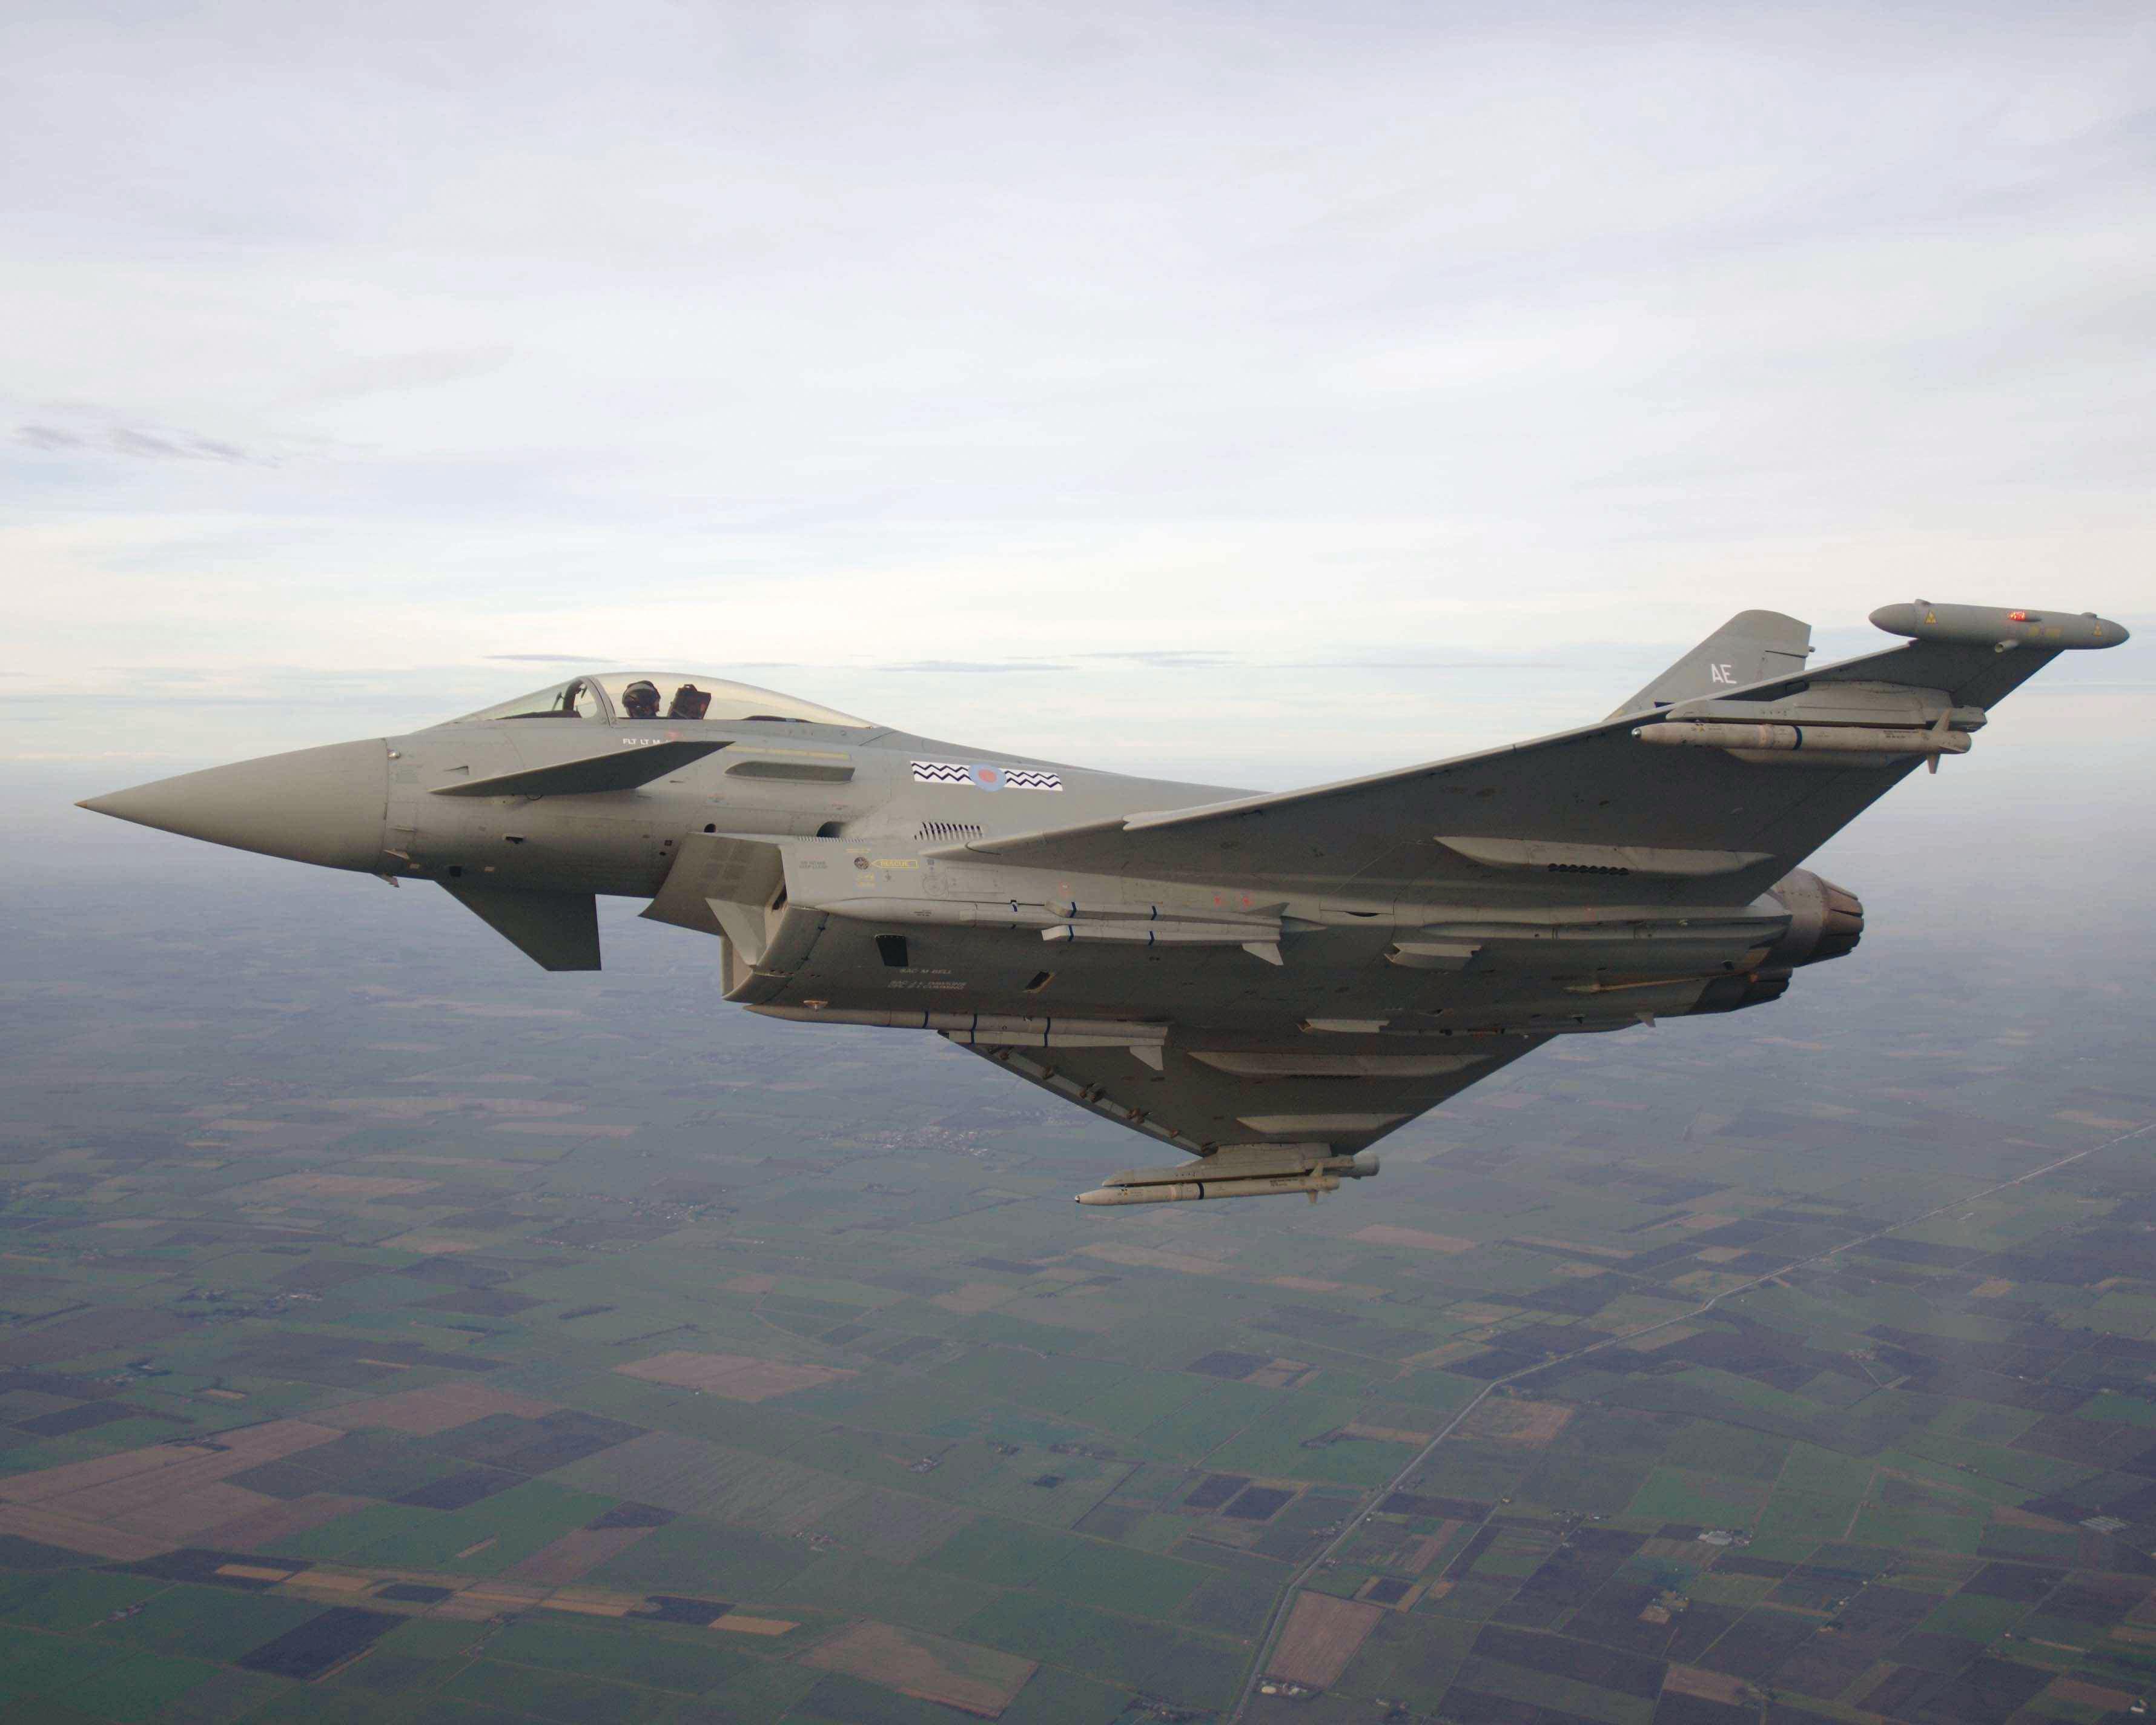 mbda-meteor-eurofighter-arabie-saoudite-allemagne-exportation